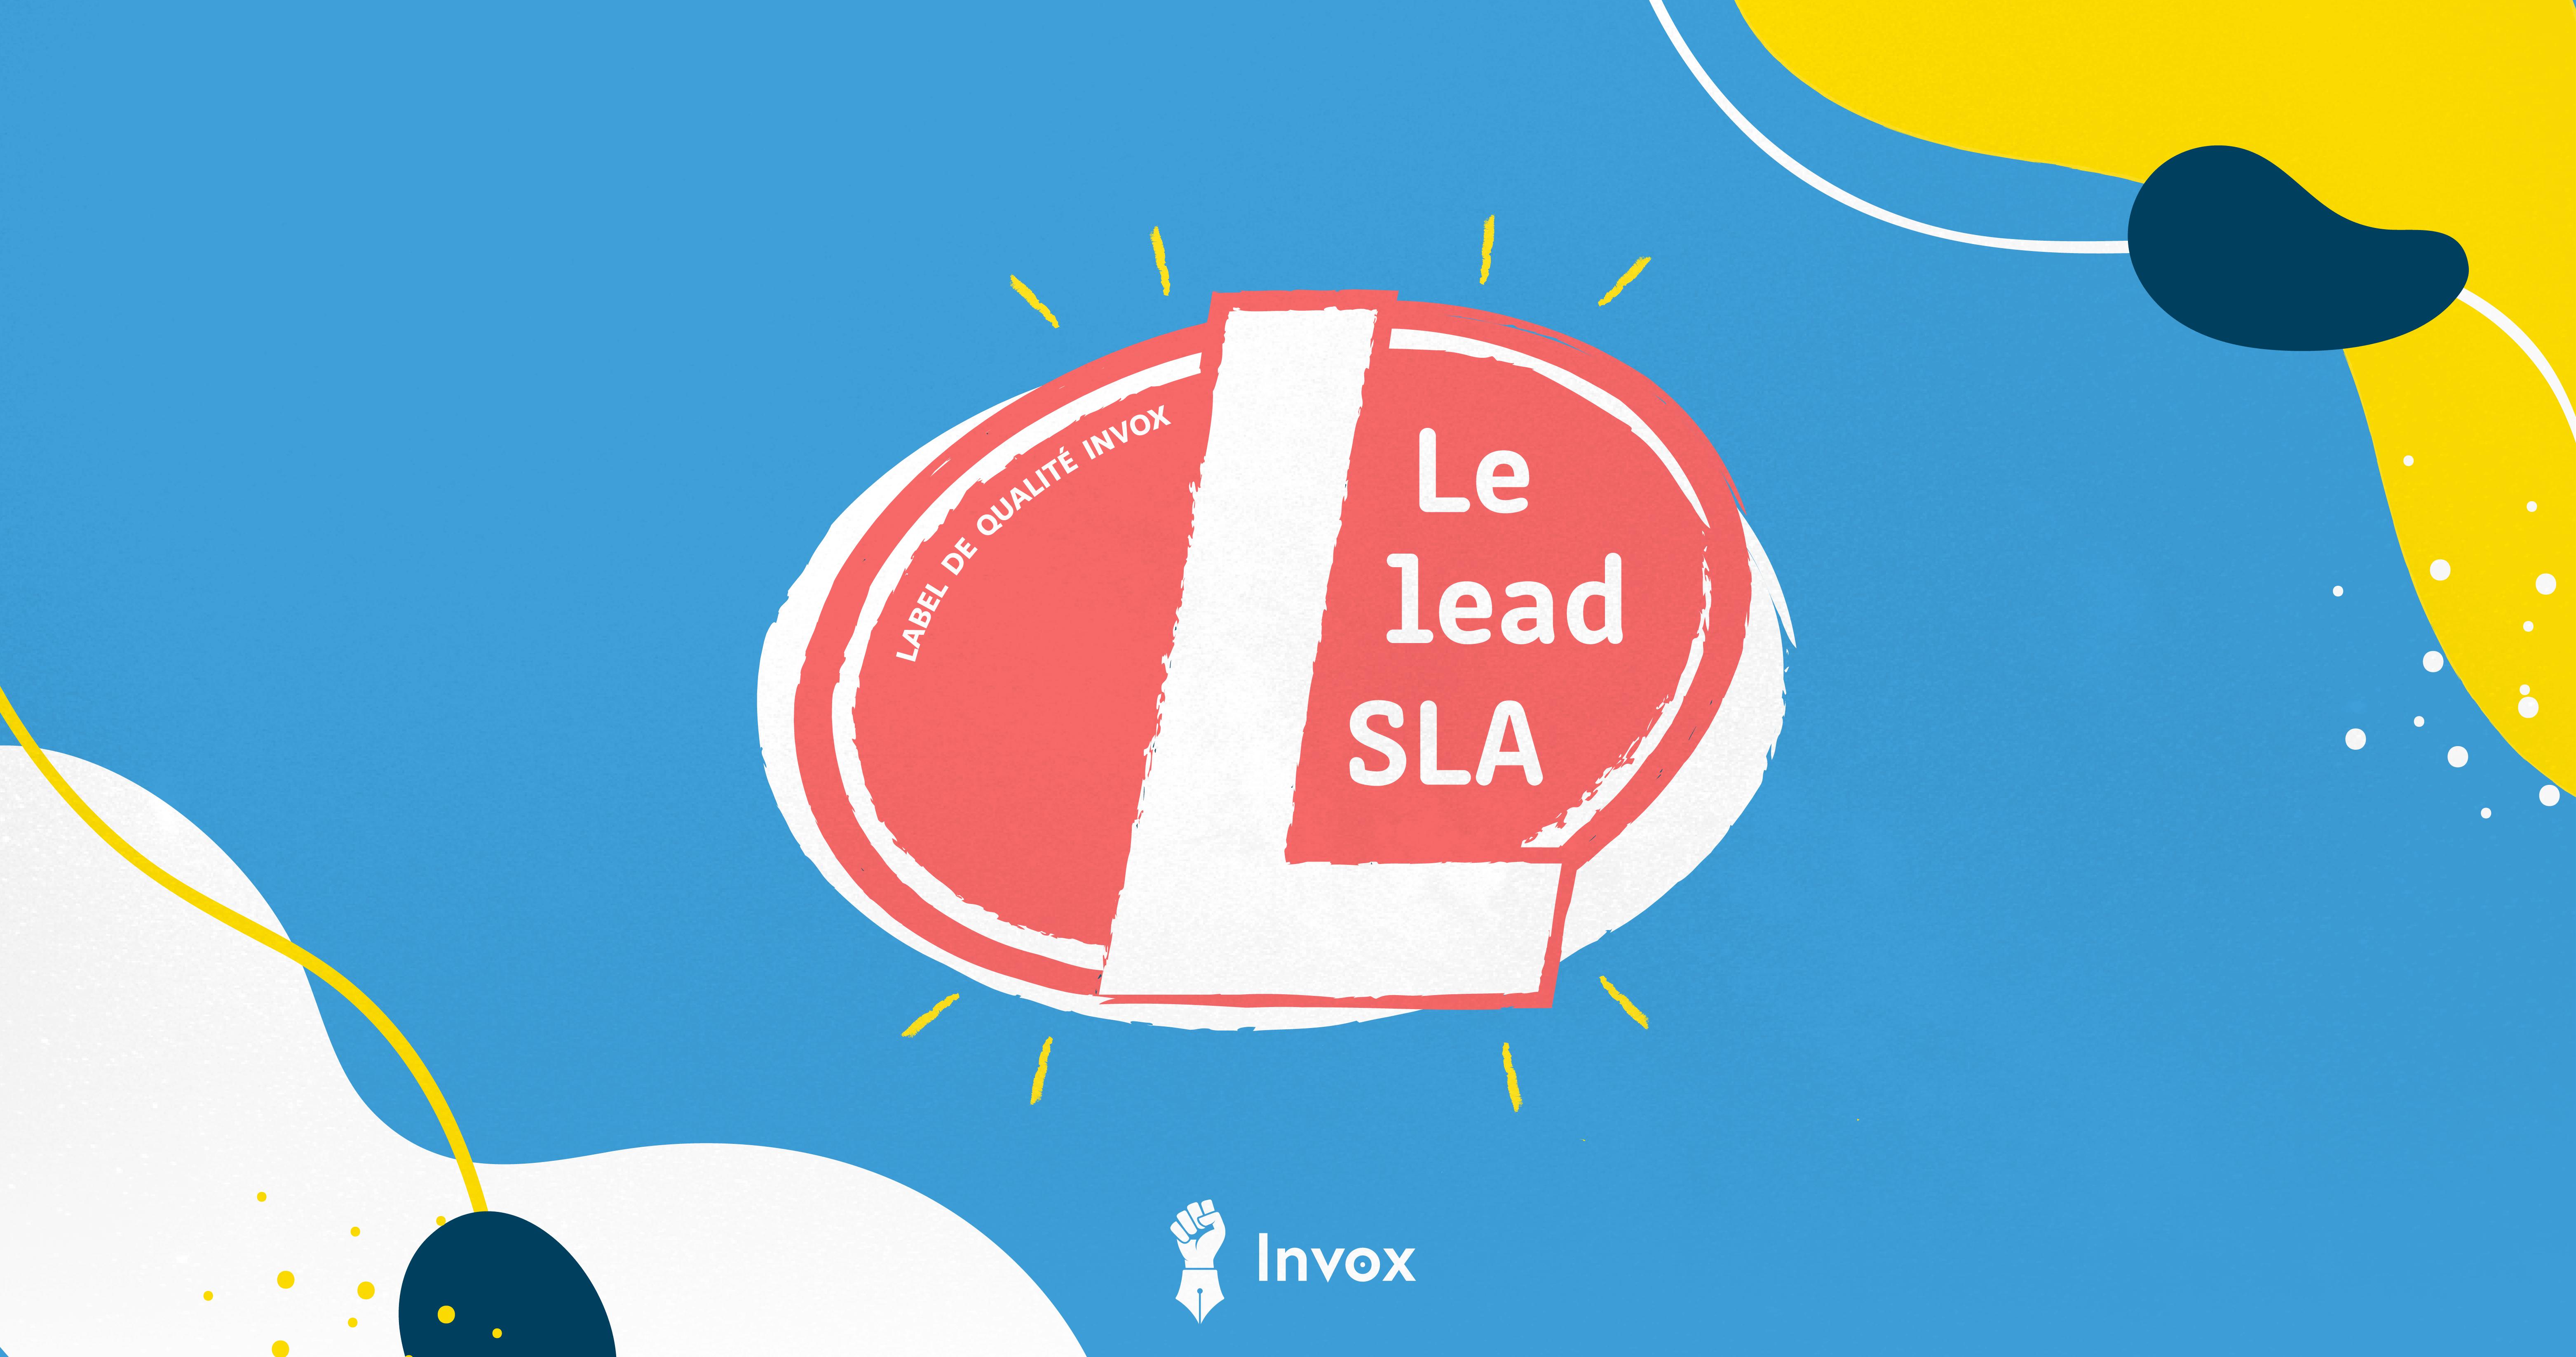 lead SLA